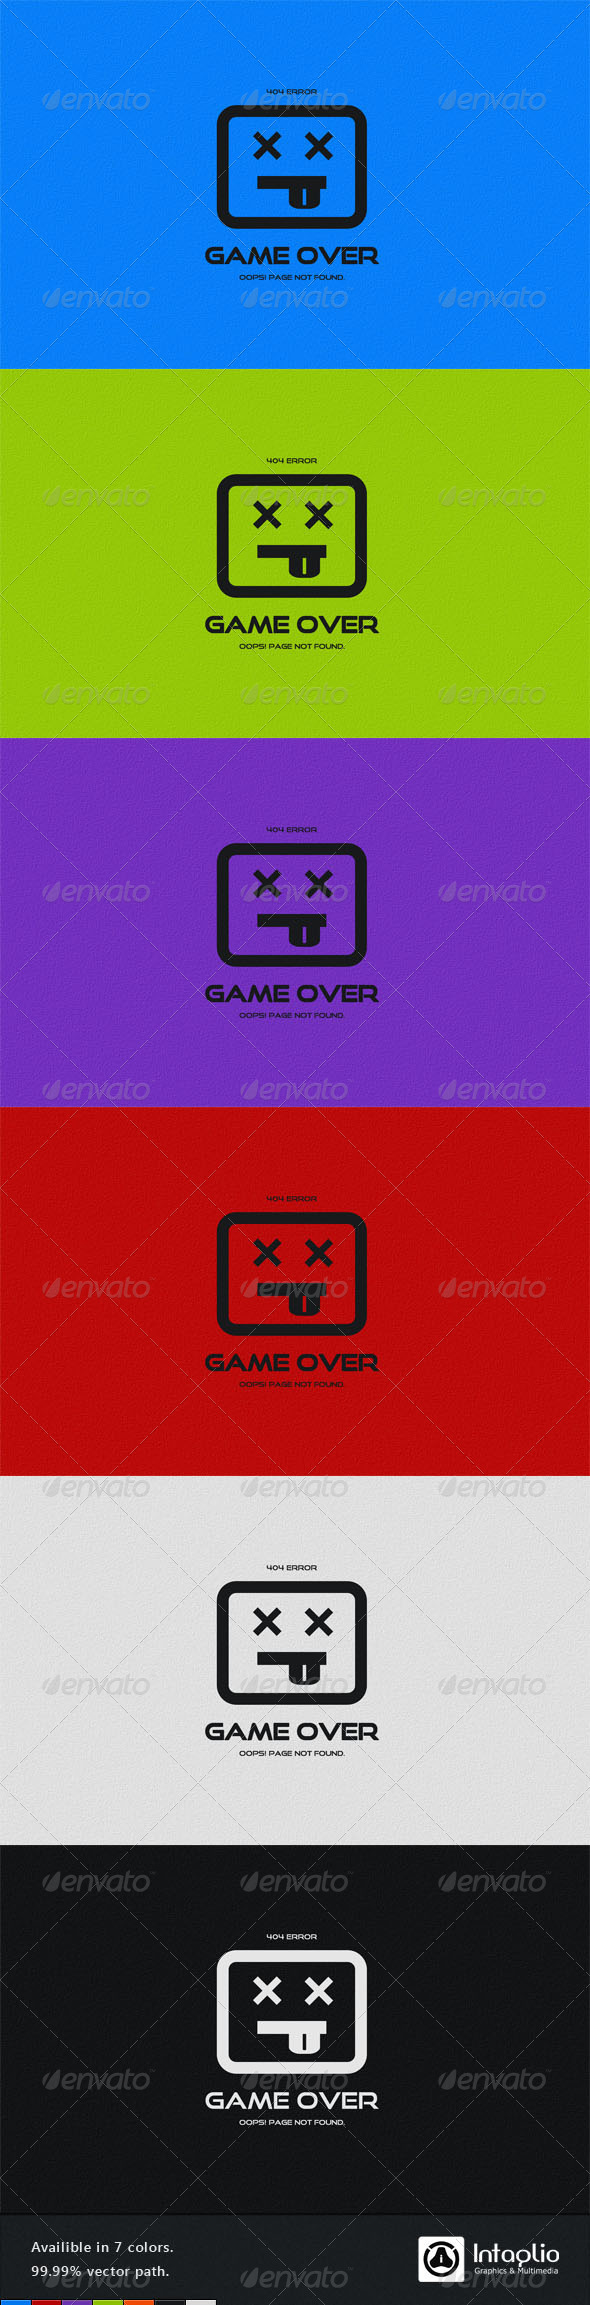 GraphicRiver Game Over 404 Error Page 866894